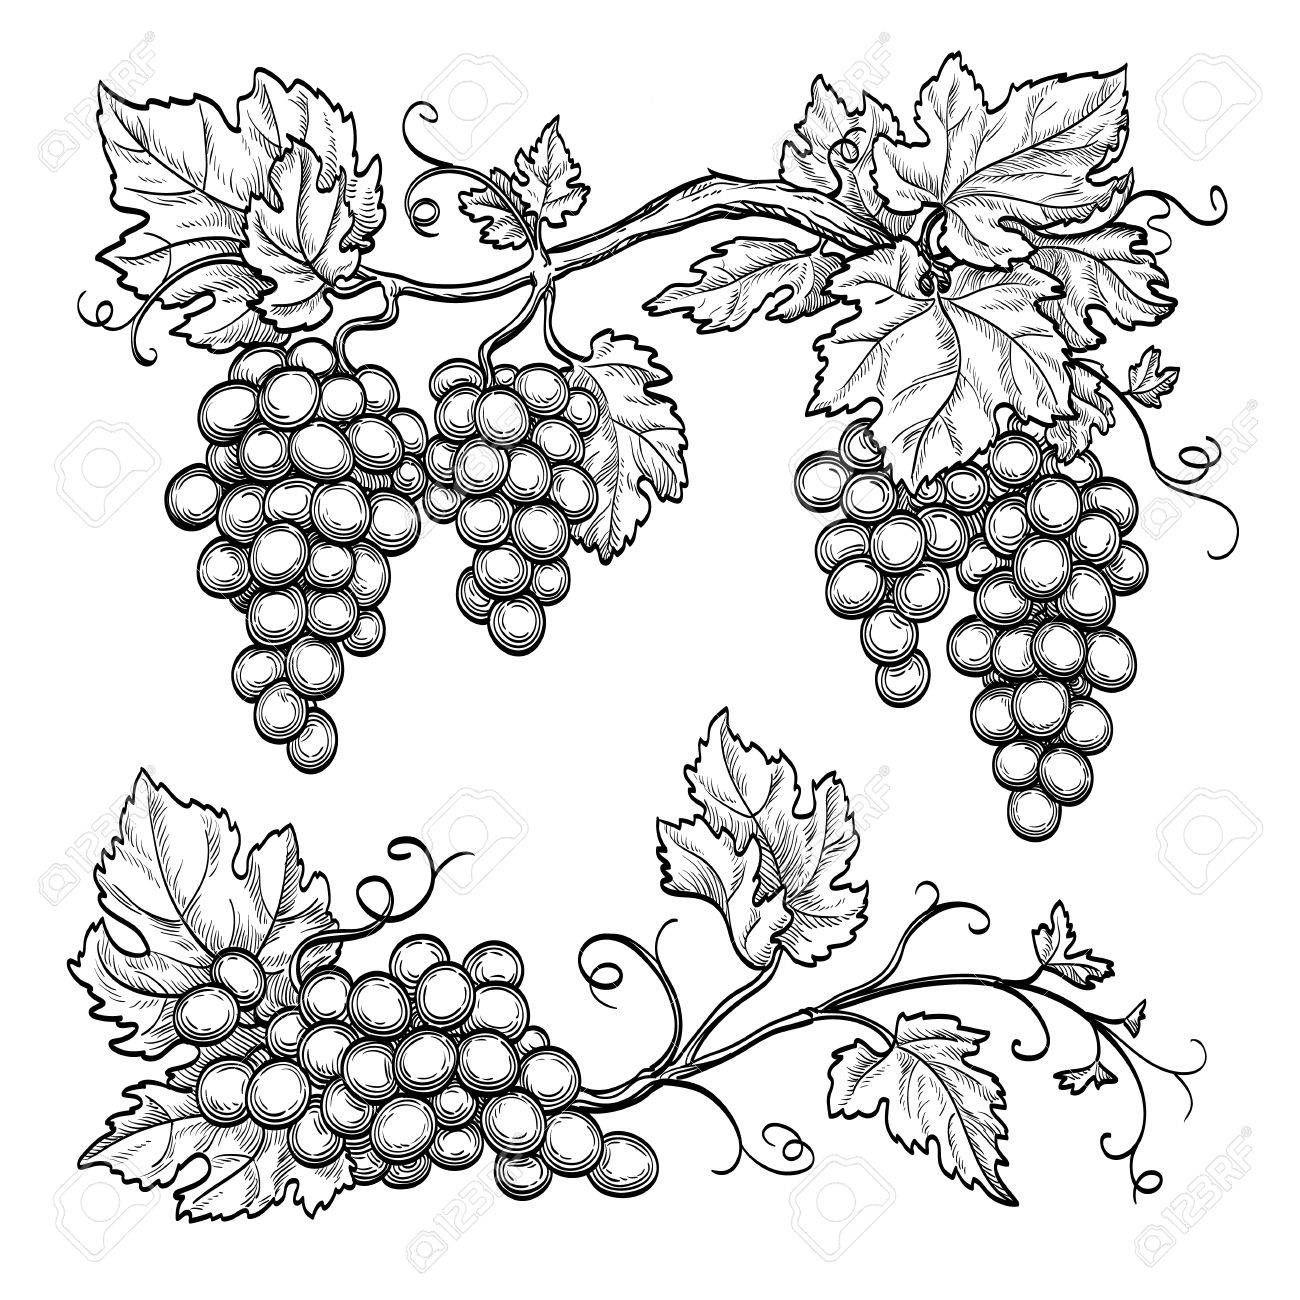 Image Result For Grape Leaves Drawing Vine Drawing Grape Drawing Leaf Drawing